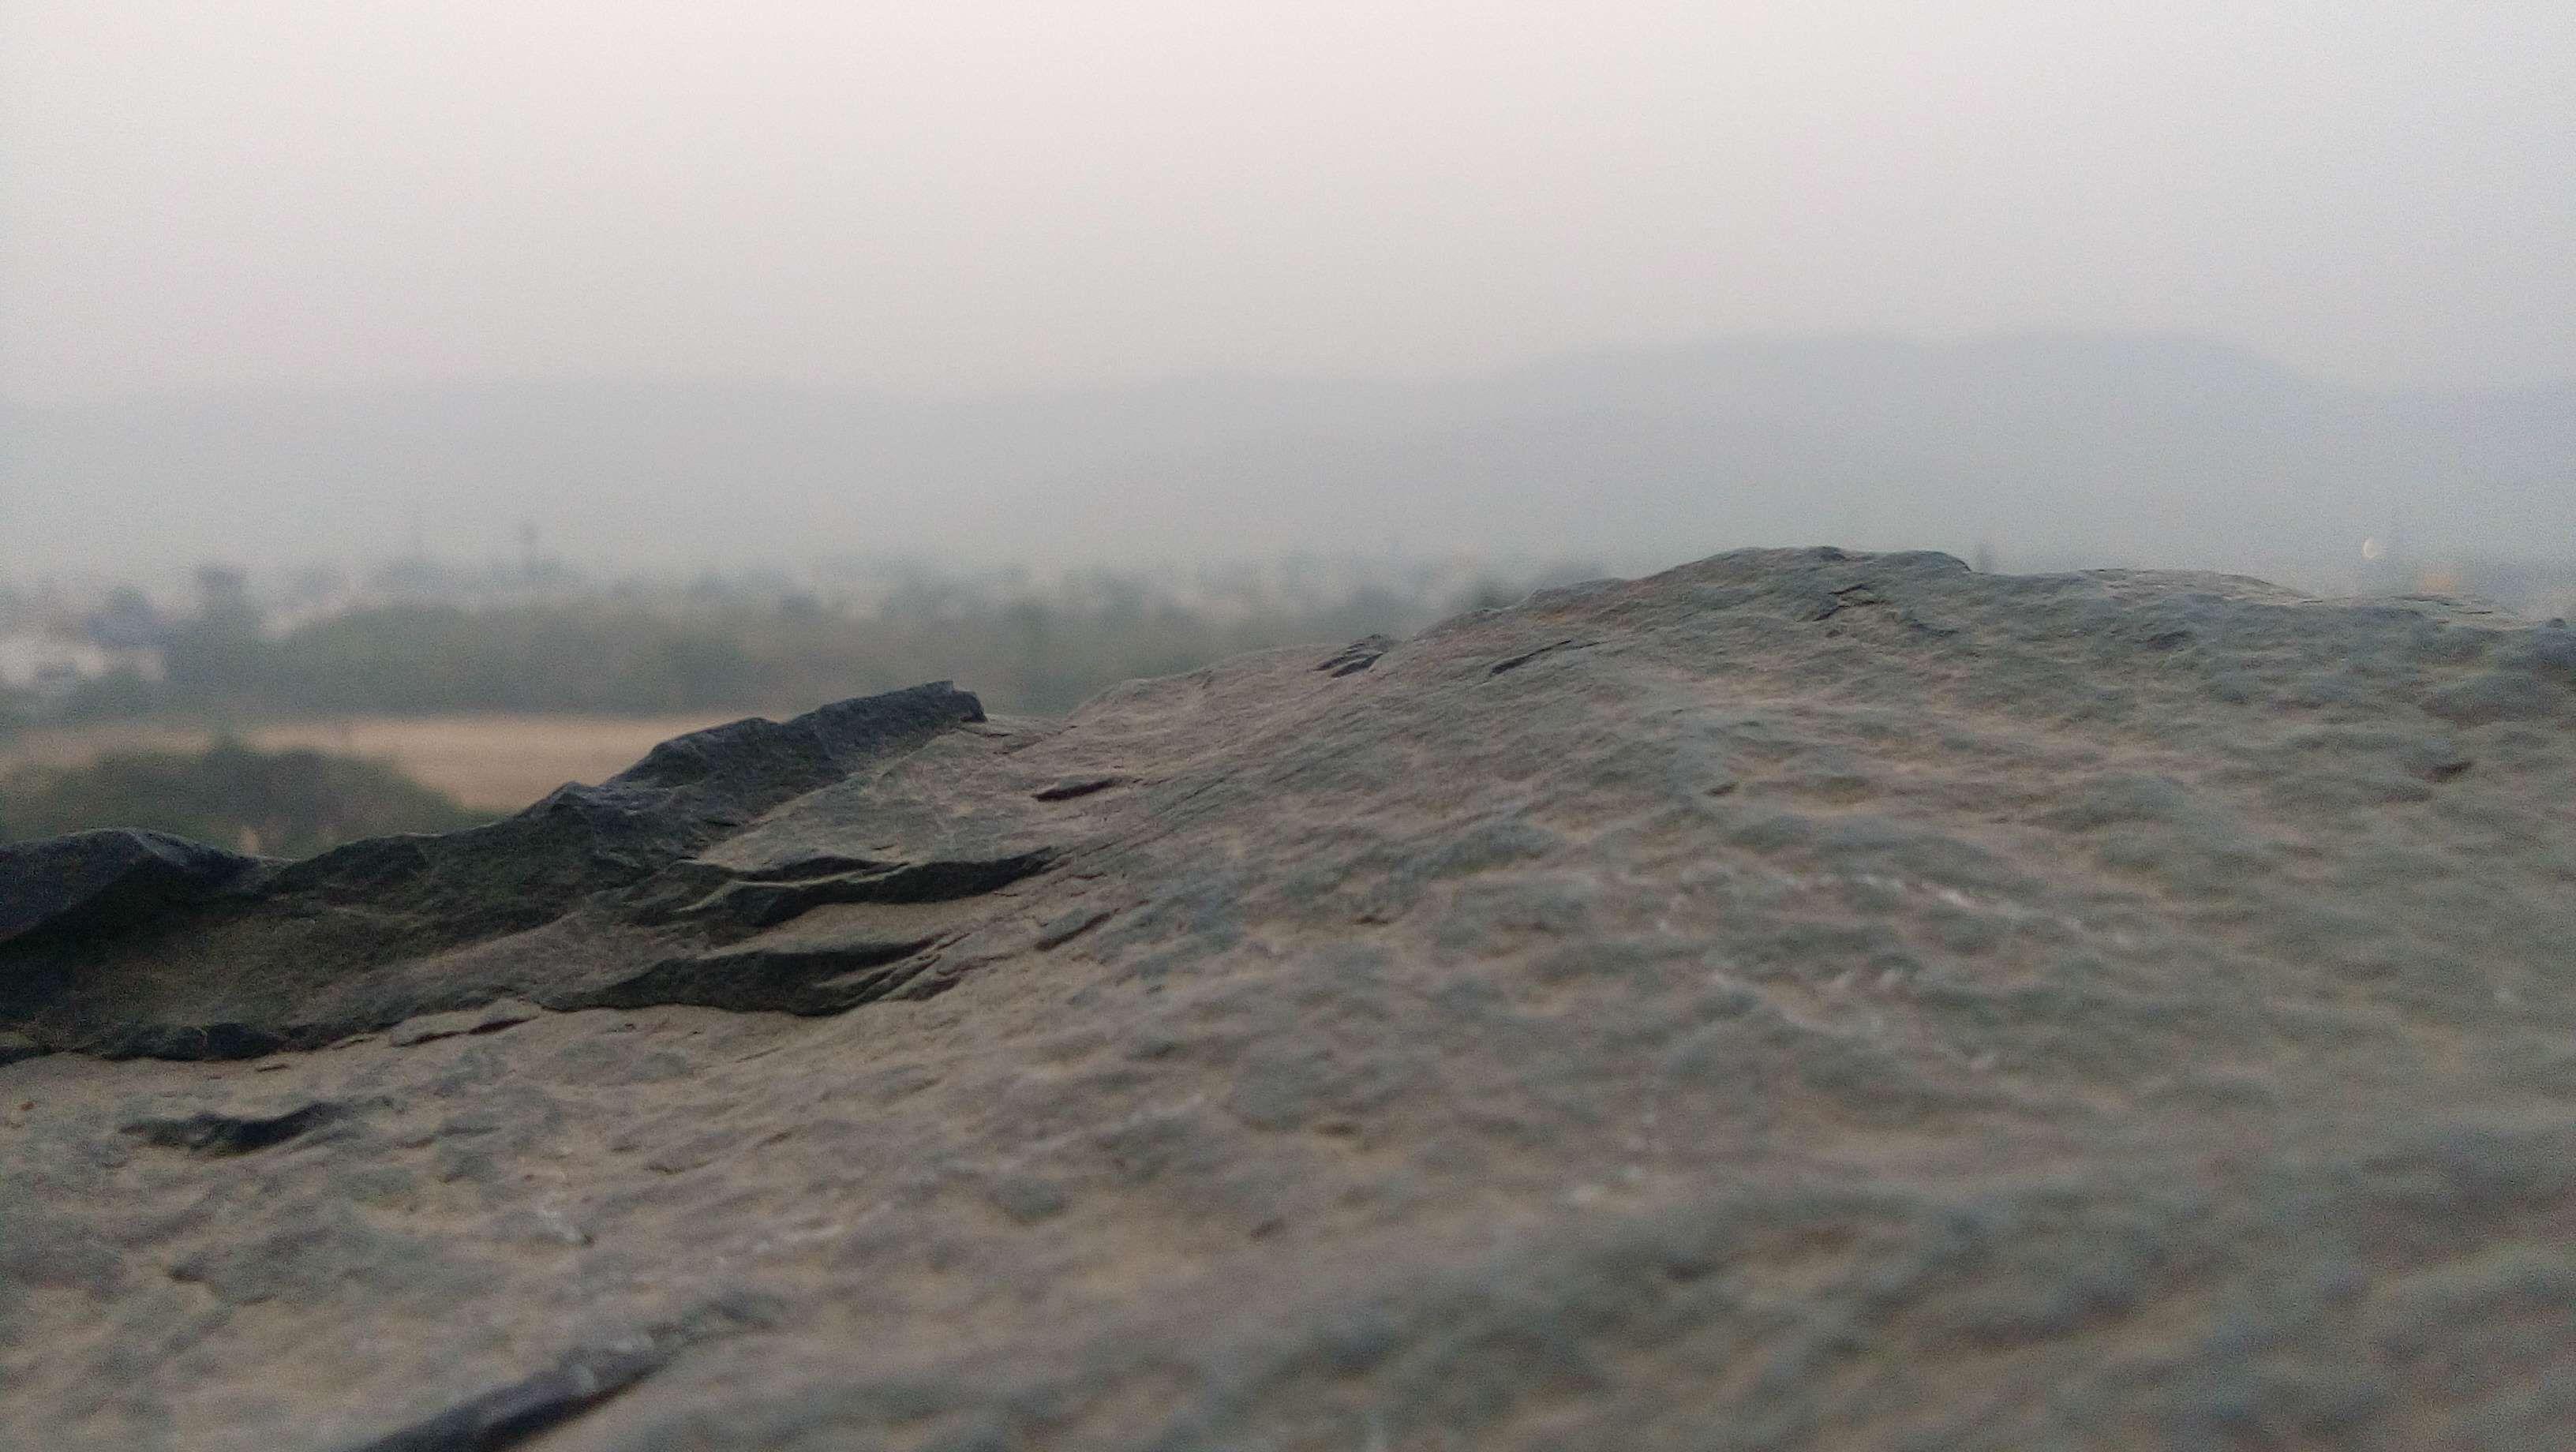 #mossy rocks #red rock #rock #rock carving #rock climbing #rock n roll #rock pic #walls